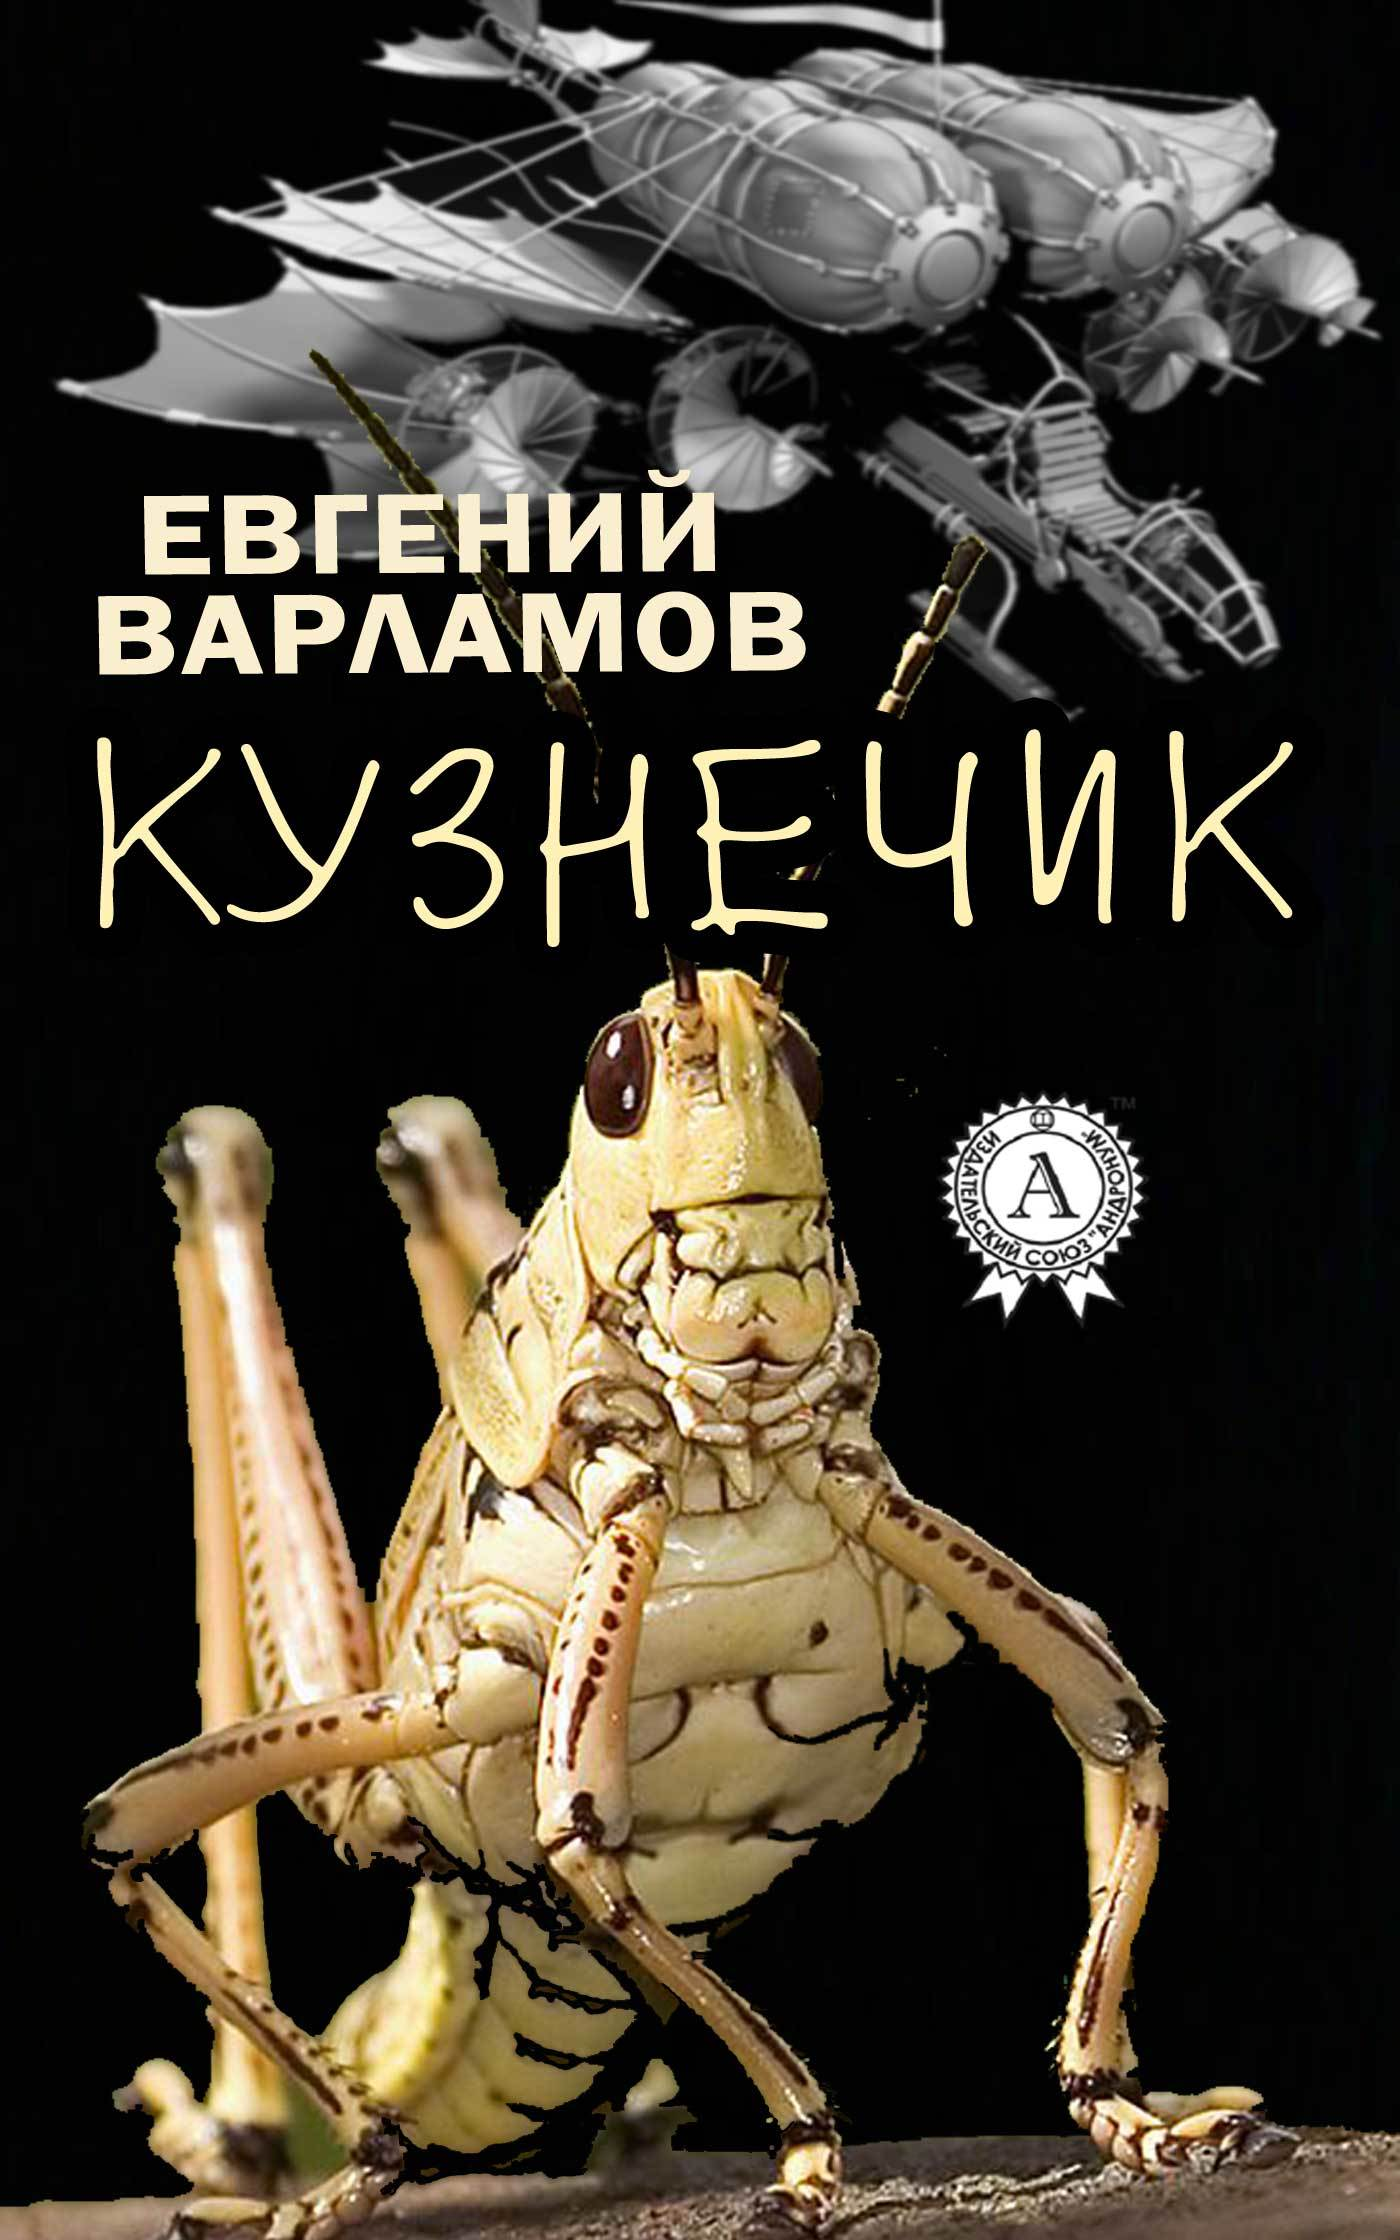 Евгений Варламов - Кузнечик